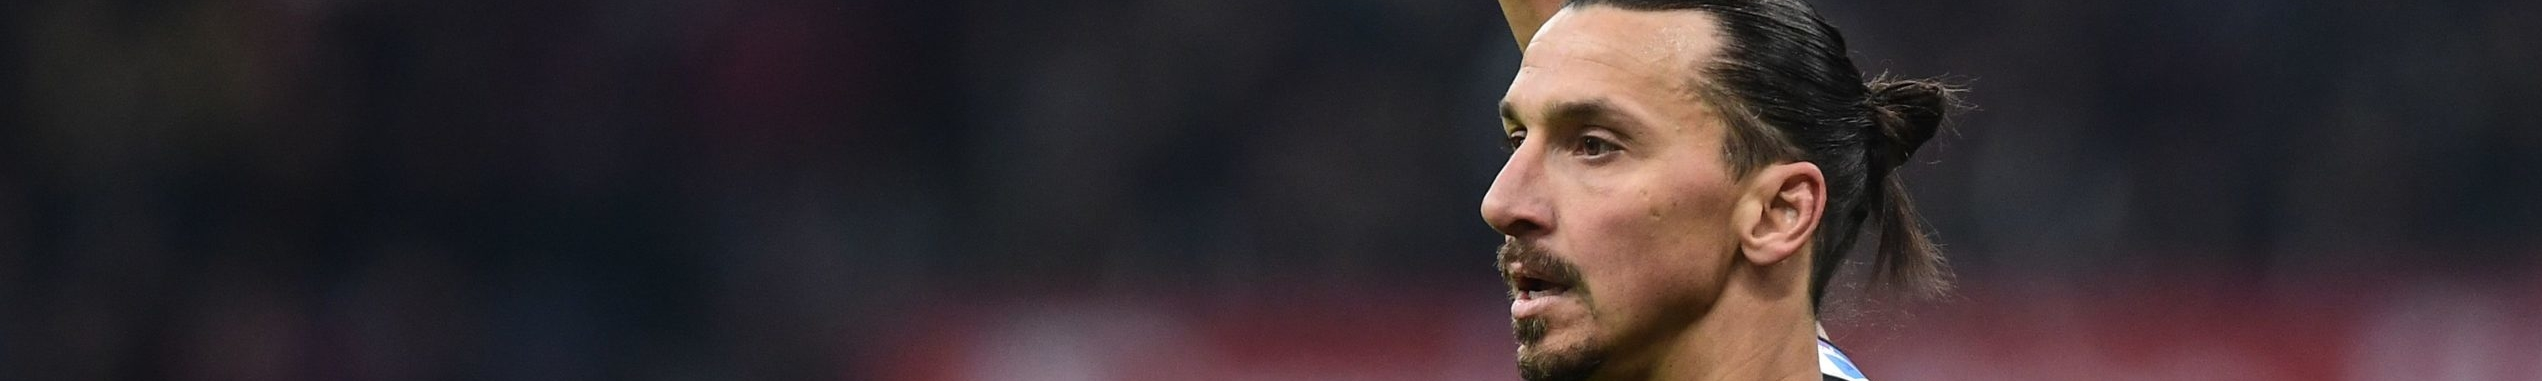 Milan-Udinese: Ibra vuole esultare